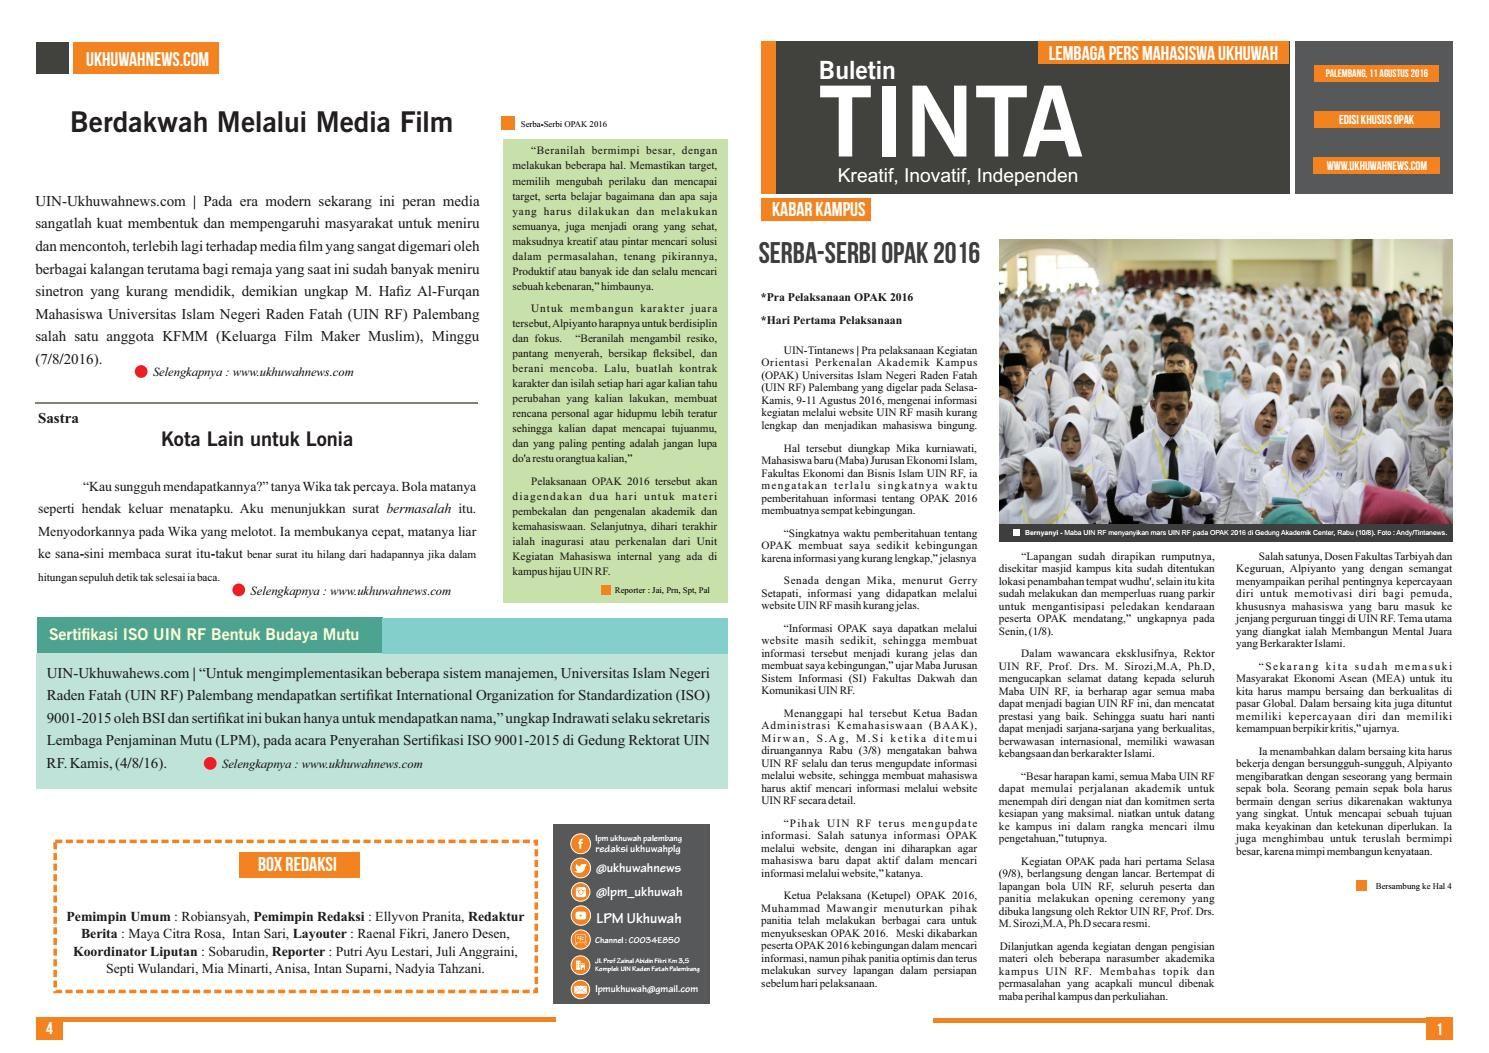 Buletin Tinta Edisi 33 (Edisi Khusu OPAK)